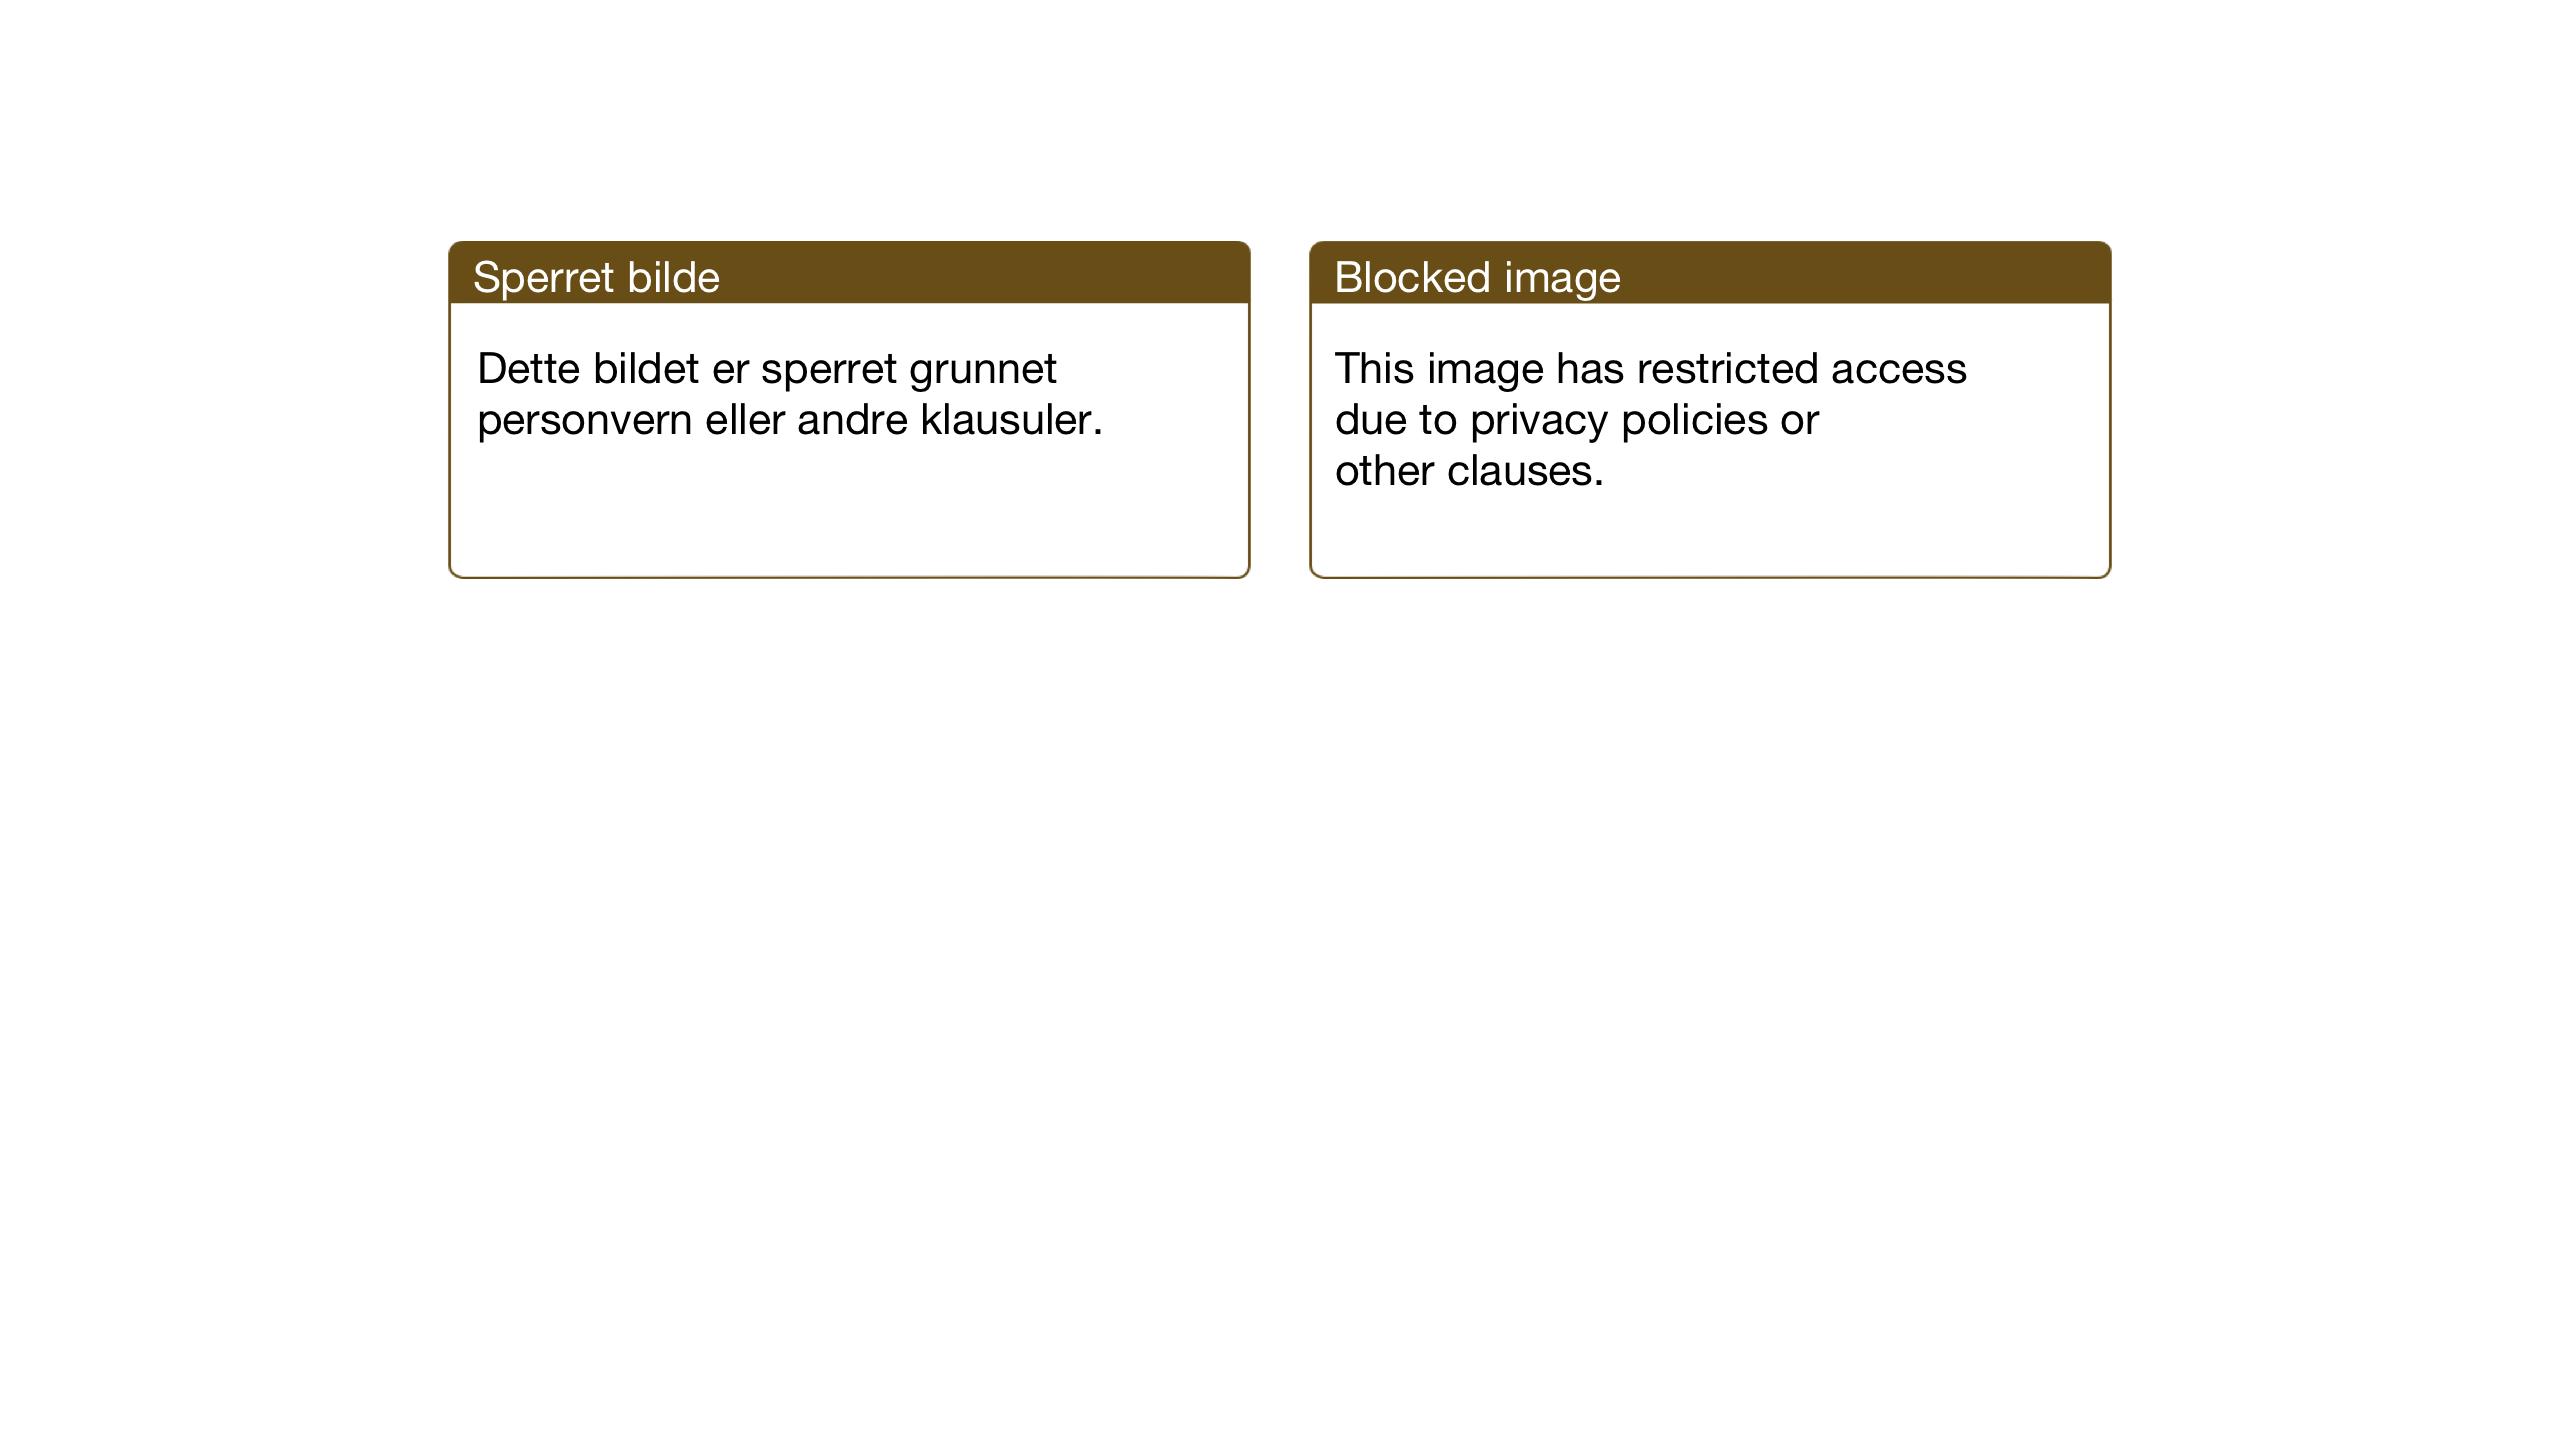 SAH, Vardal prestekontor, H/Ha/Haa/L0018: Ministerialbok nr. 18, 1930-1945, s. 19